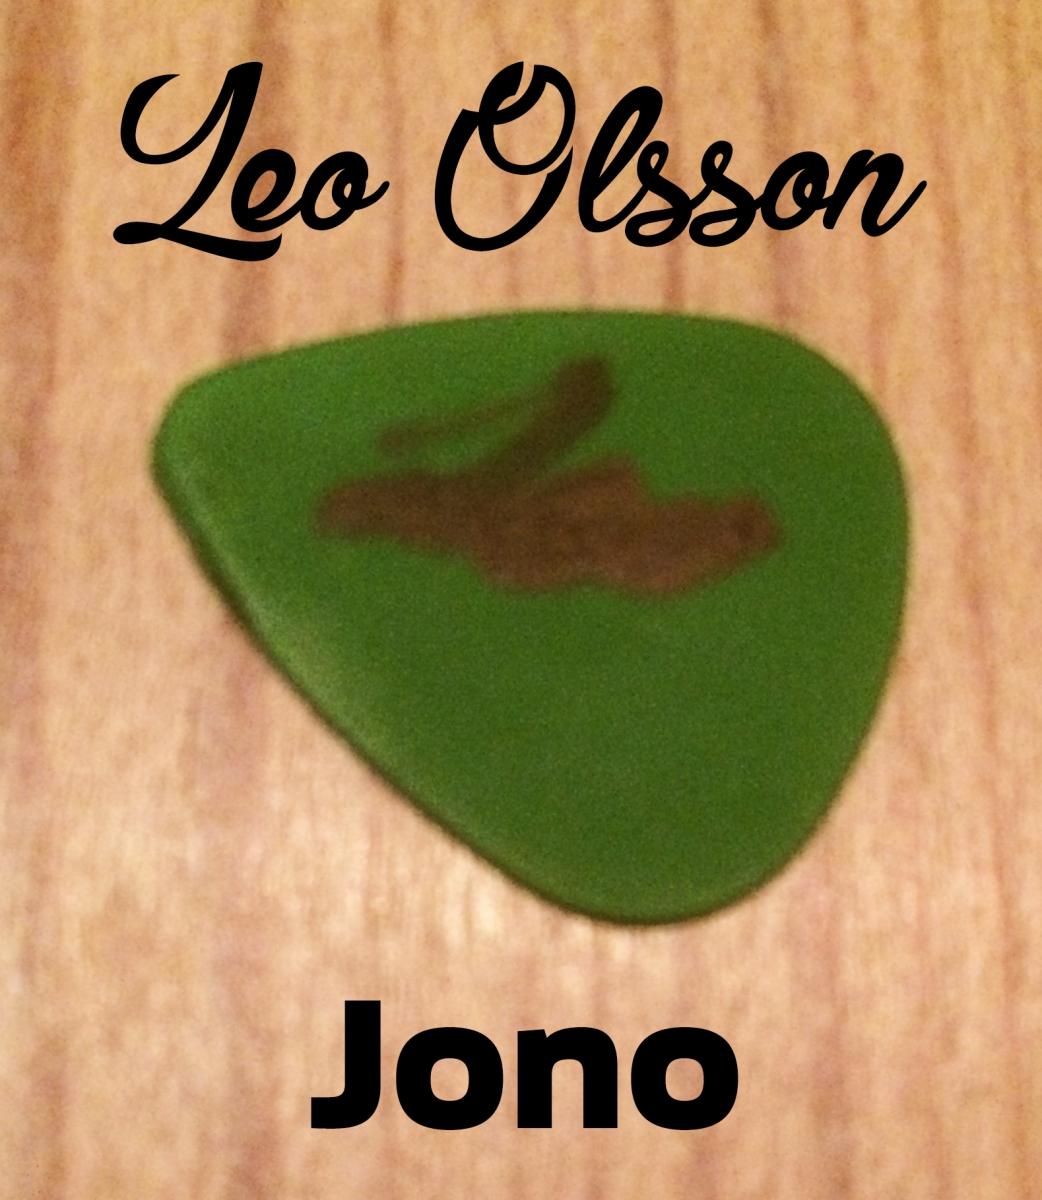 Leo Olsson